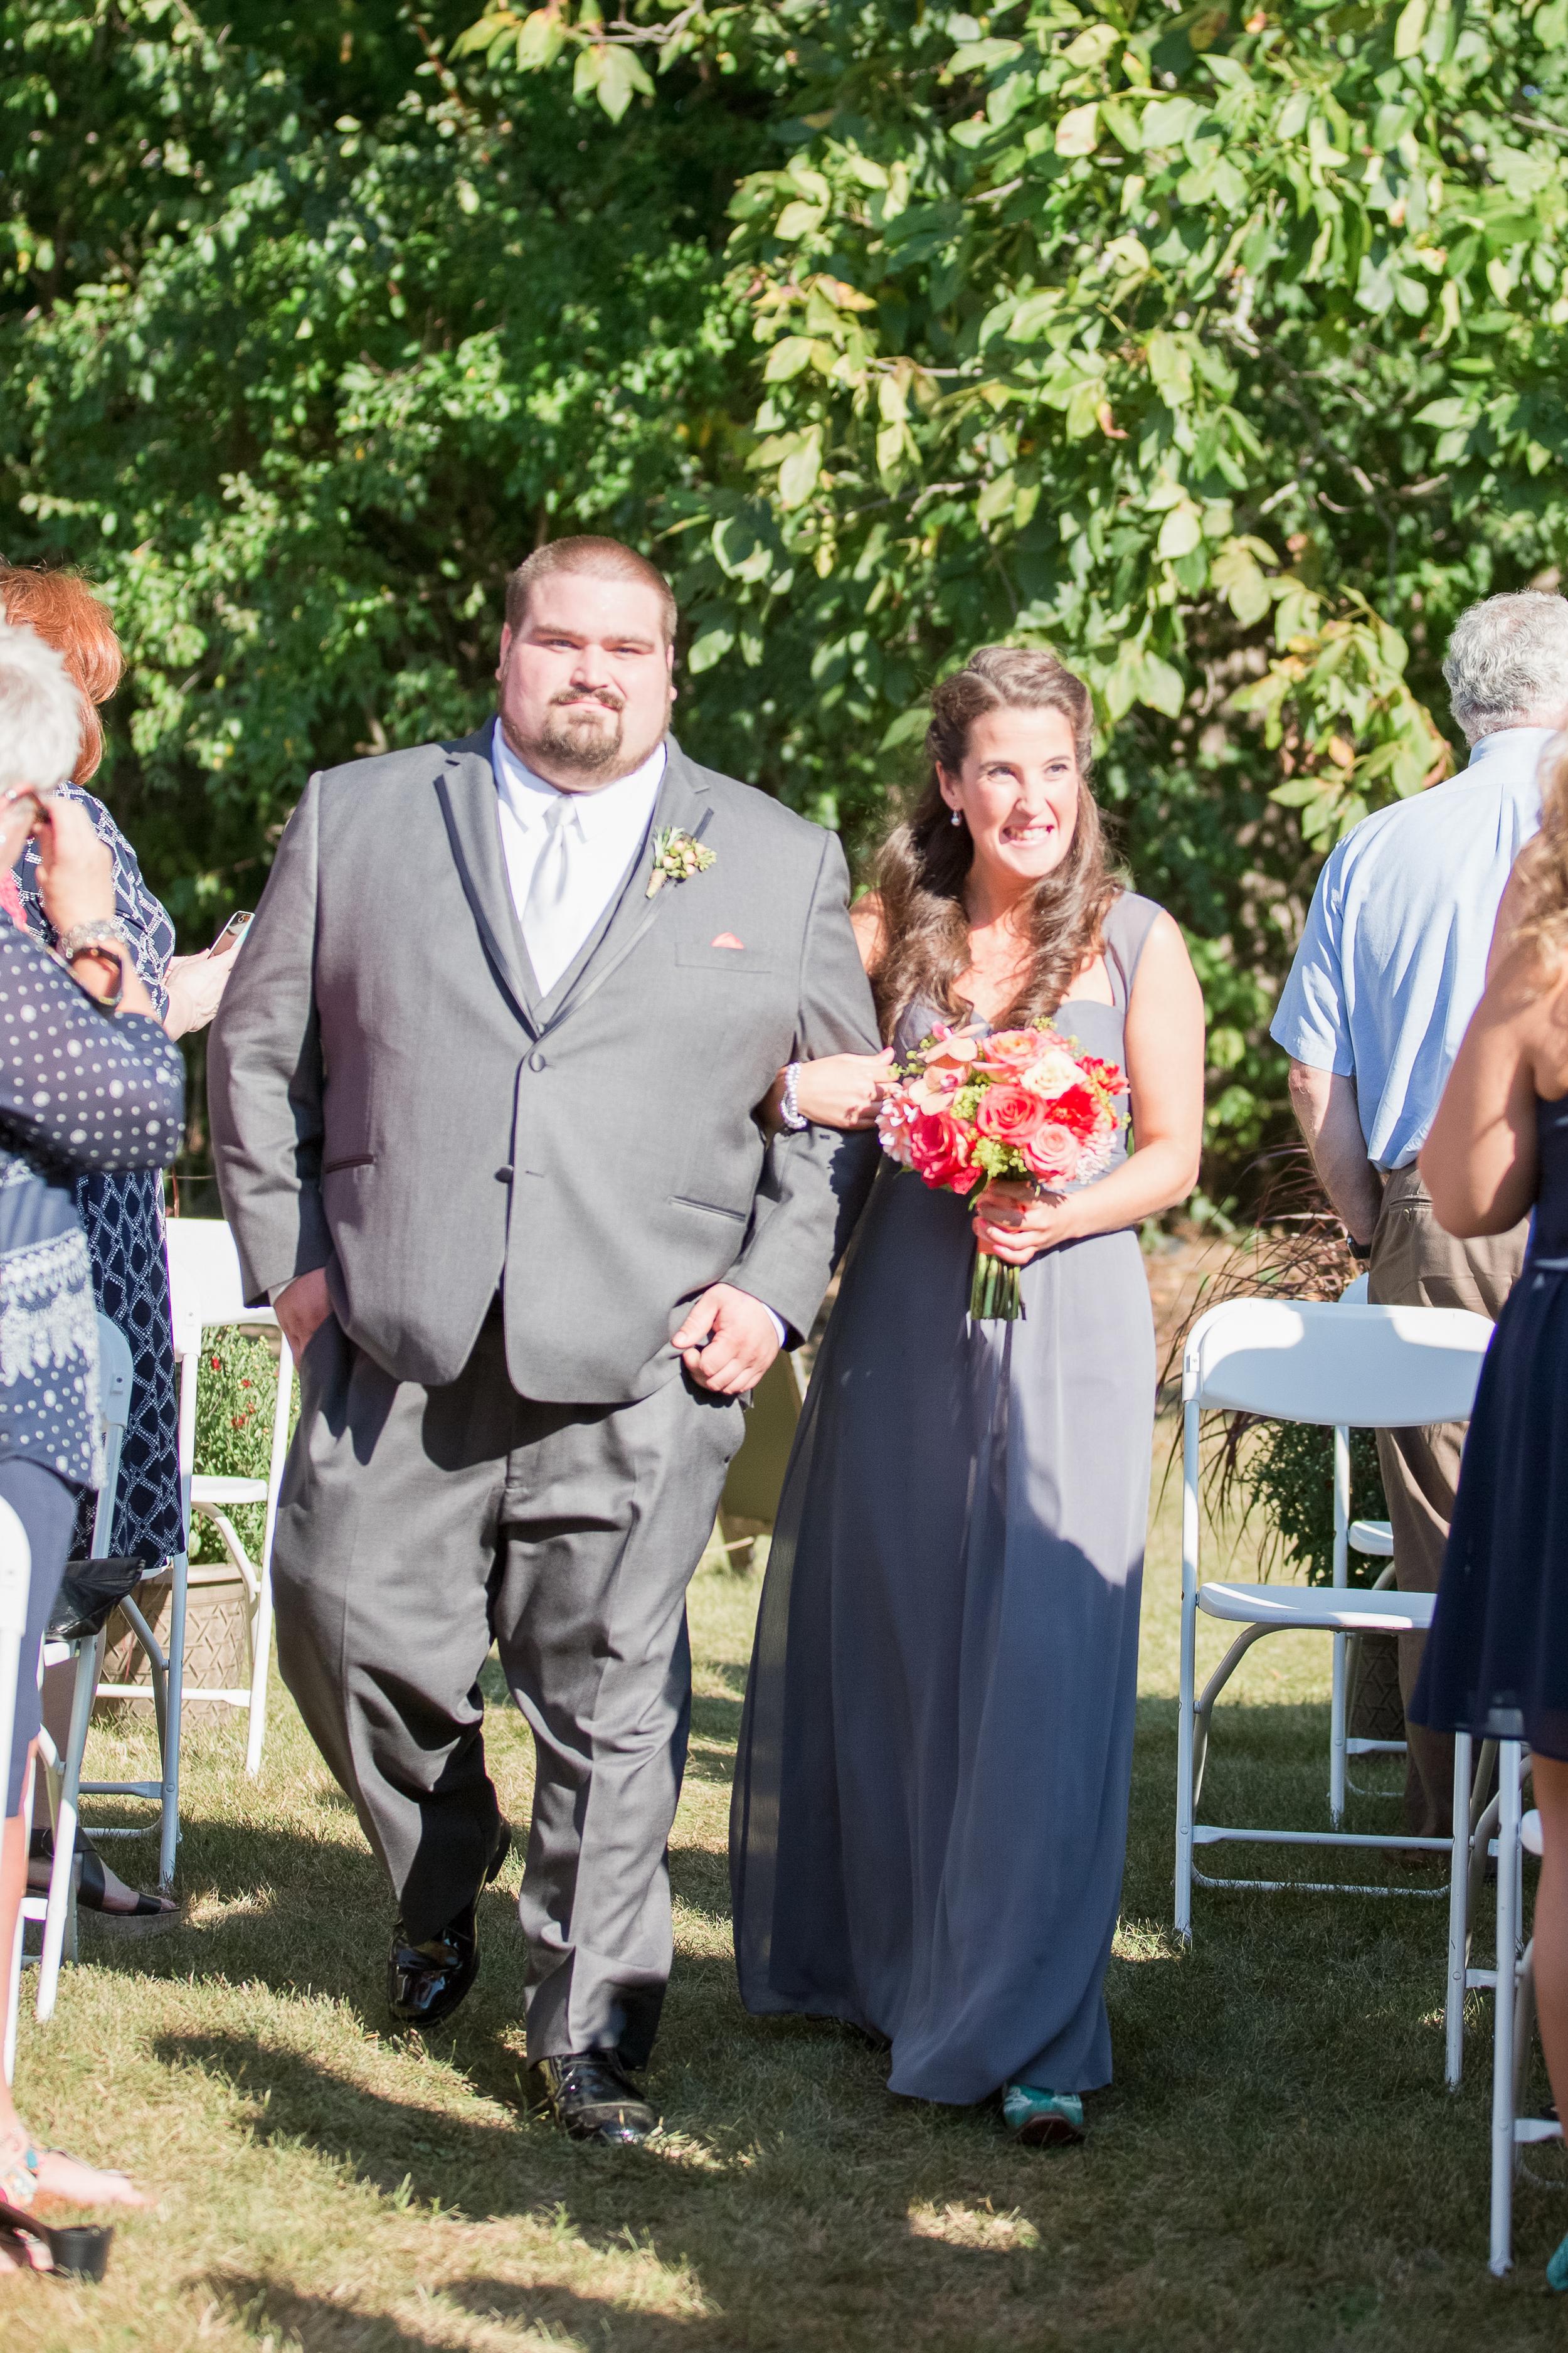 nh-wedding-photographer-amy-brown-photography-0335.JPG